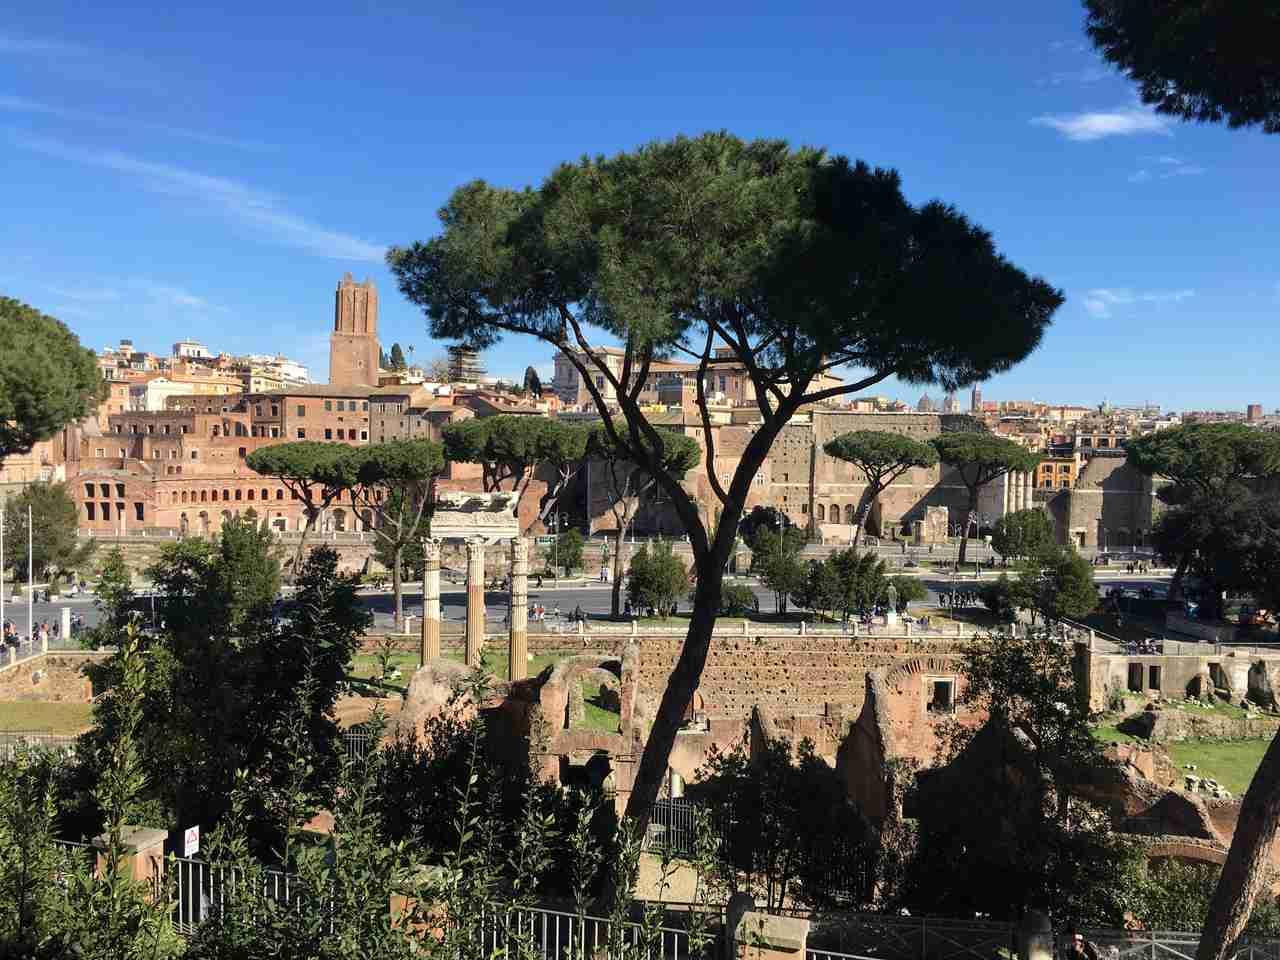 Fórum Romano em Roma. Foto de Inês Marques